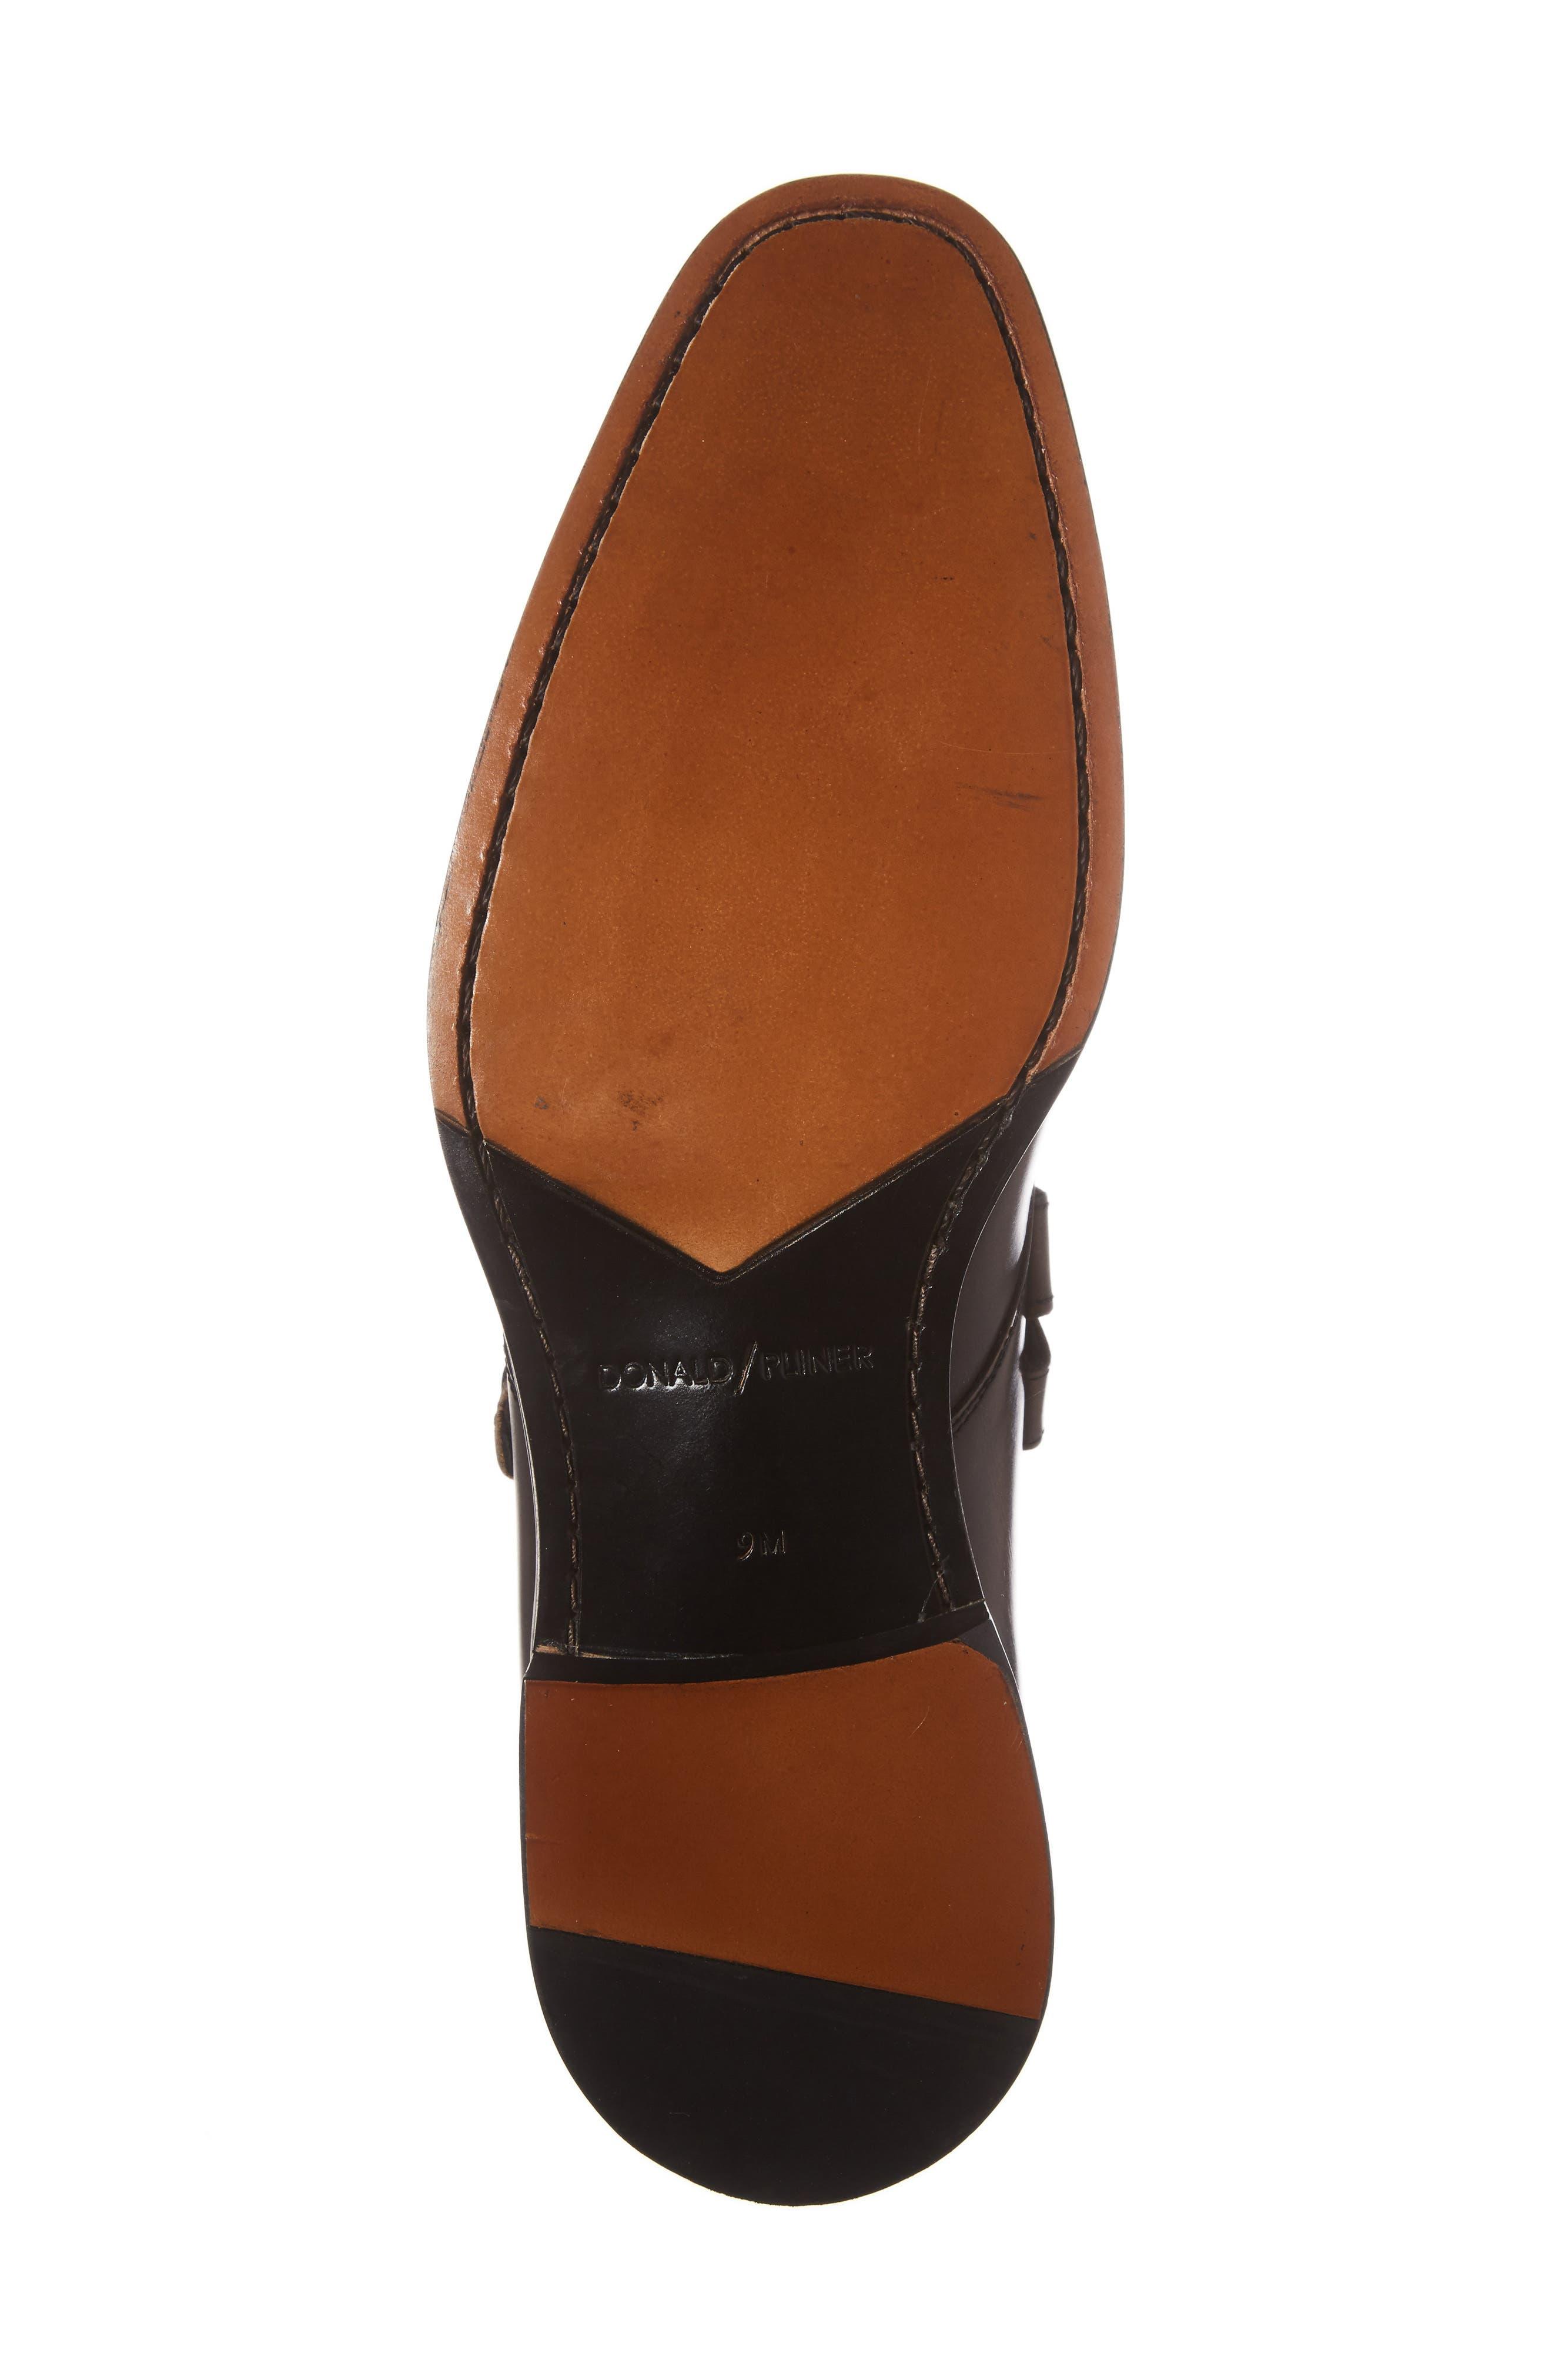 Donald J Pliner Zigor Double Monk Strap Boot,                             Alternate thumbnail 6, color,                             200